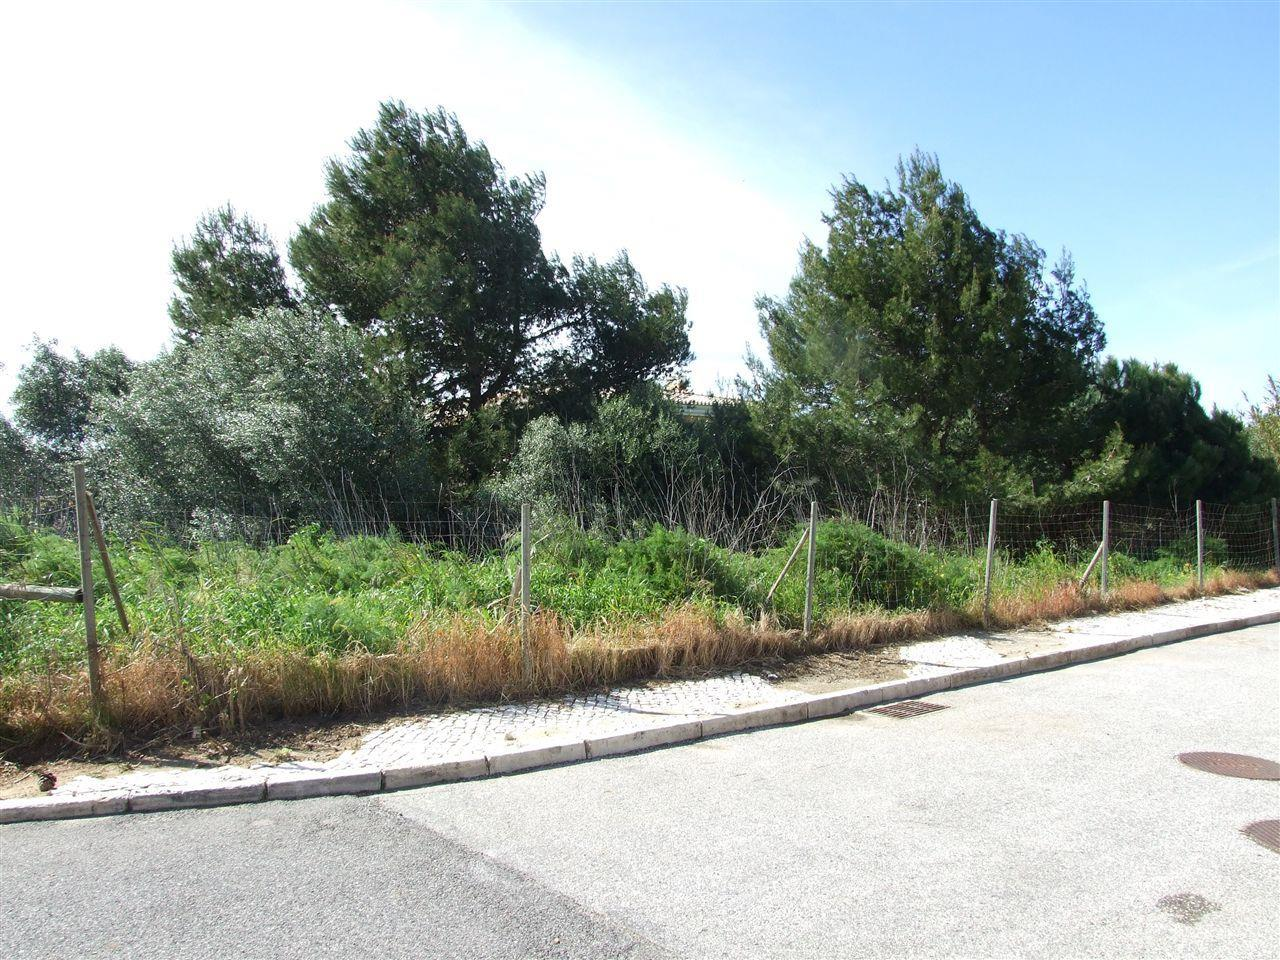 土地 为 销售 在 Real estate land for Sale Cascais, 葡京 葡萄牙